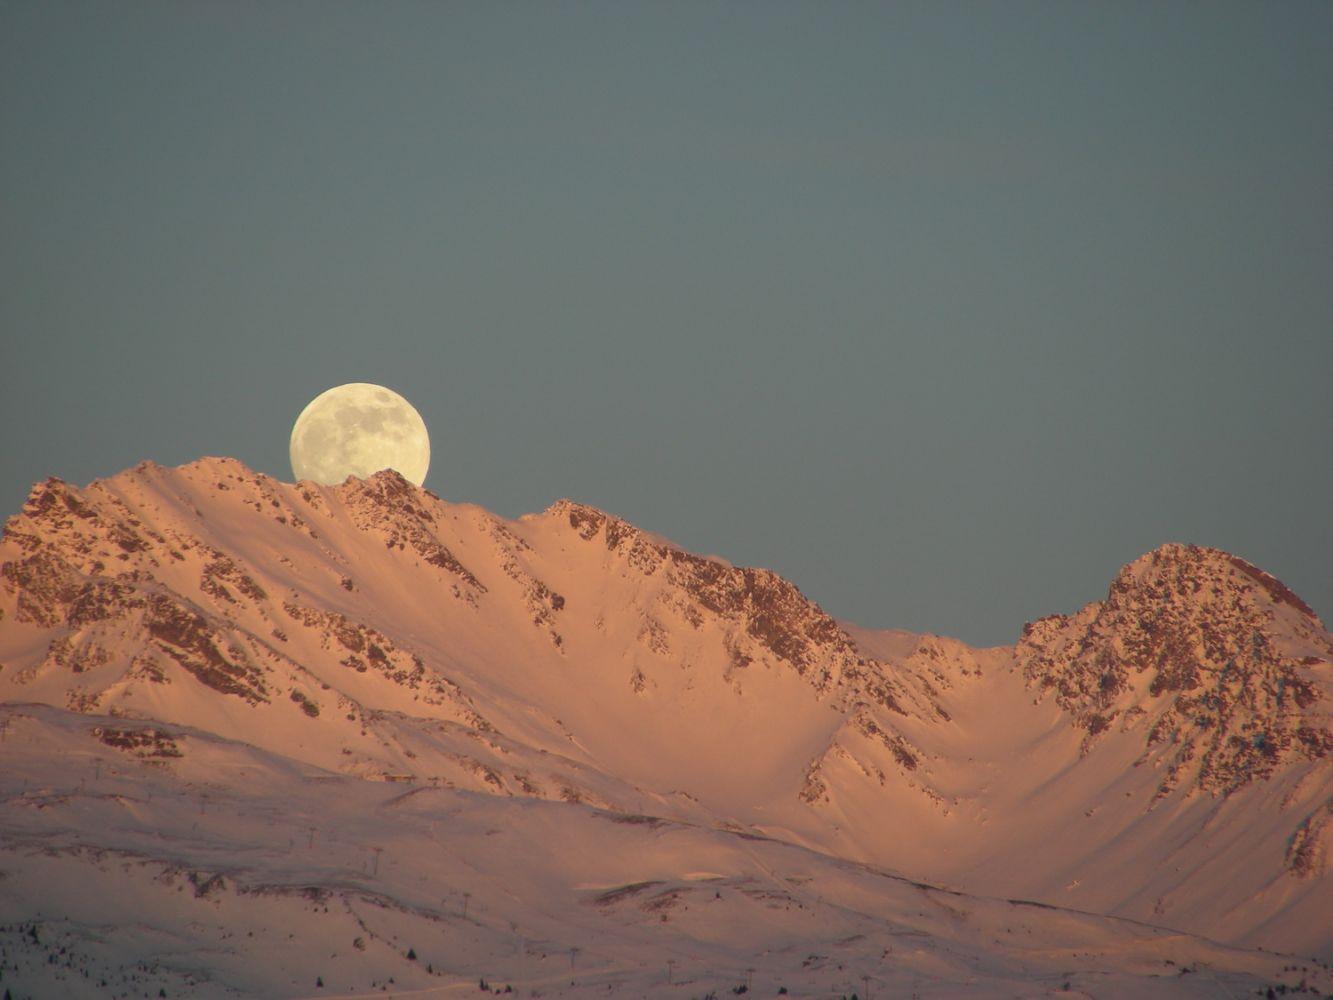 Paysages_hiver_afdv_52